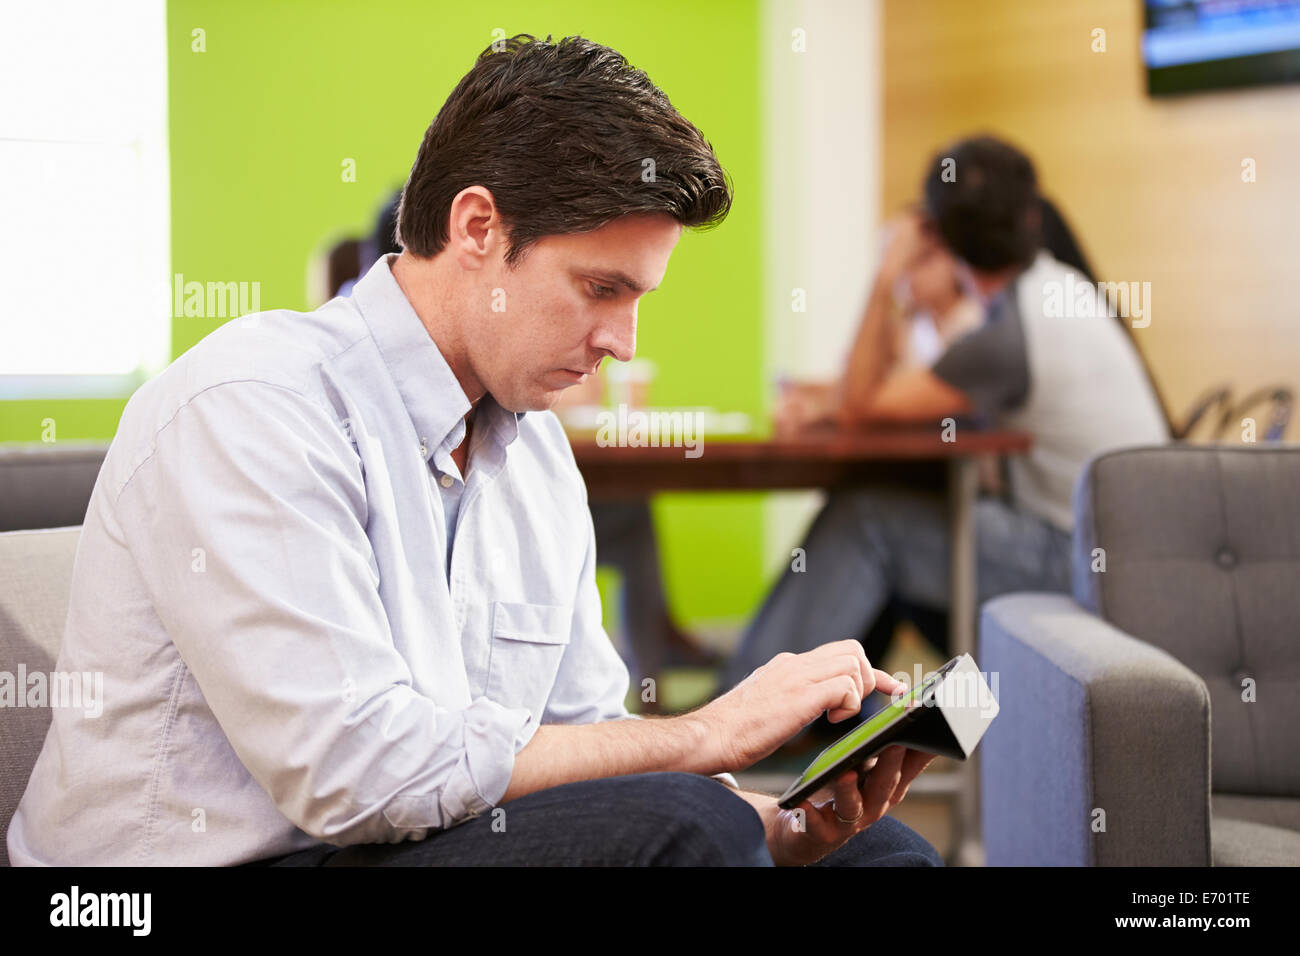 Man Taking A Break Working In Design Studio - Stock Image